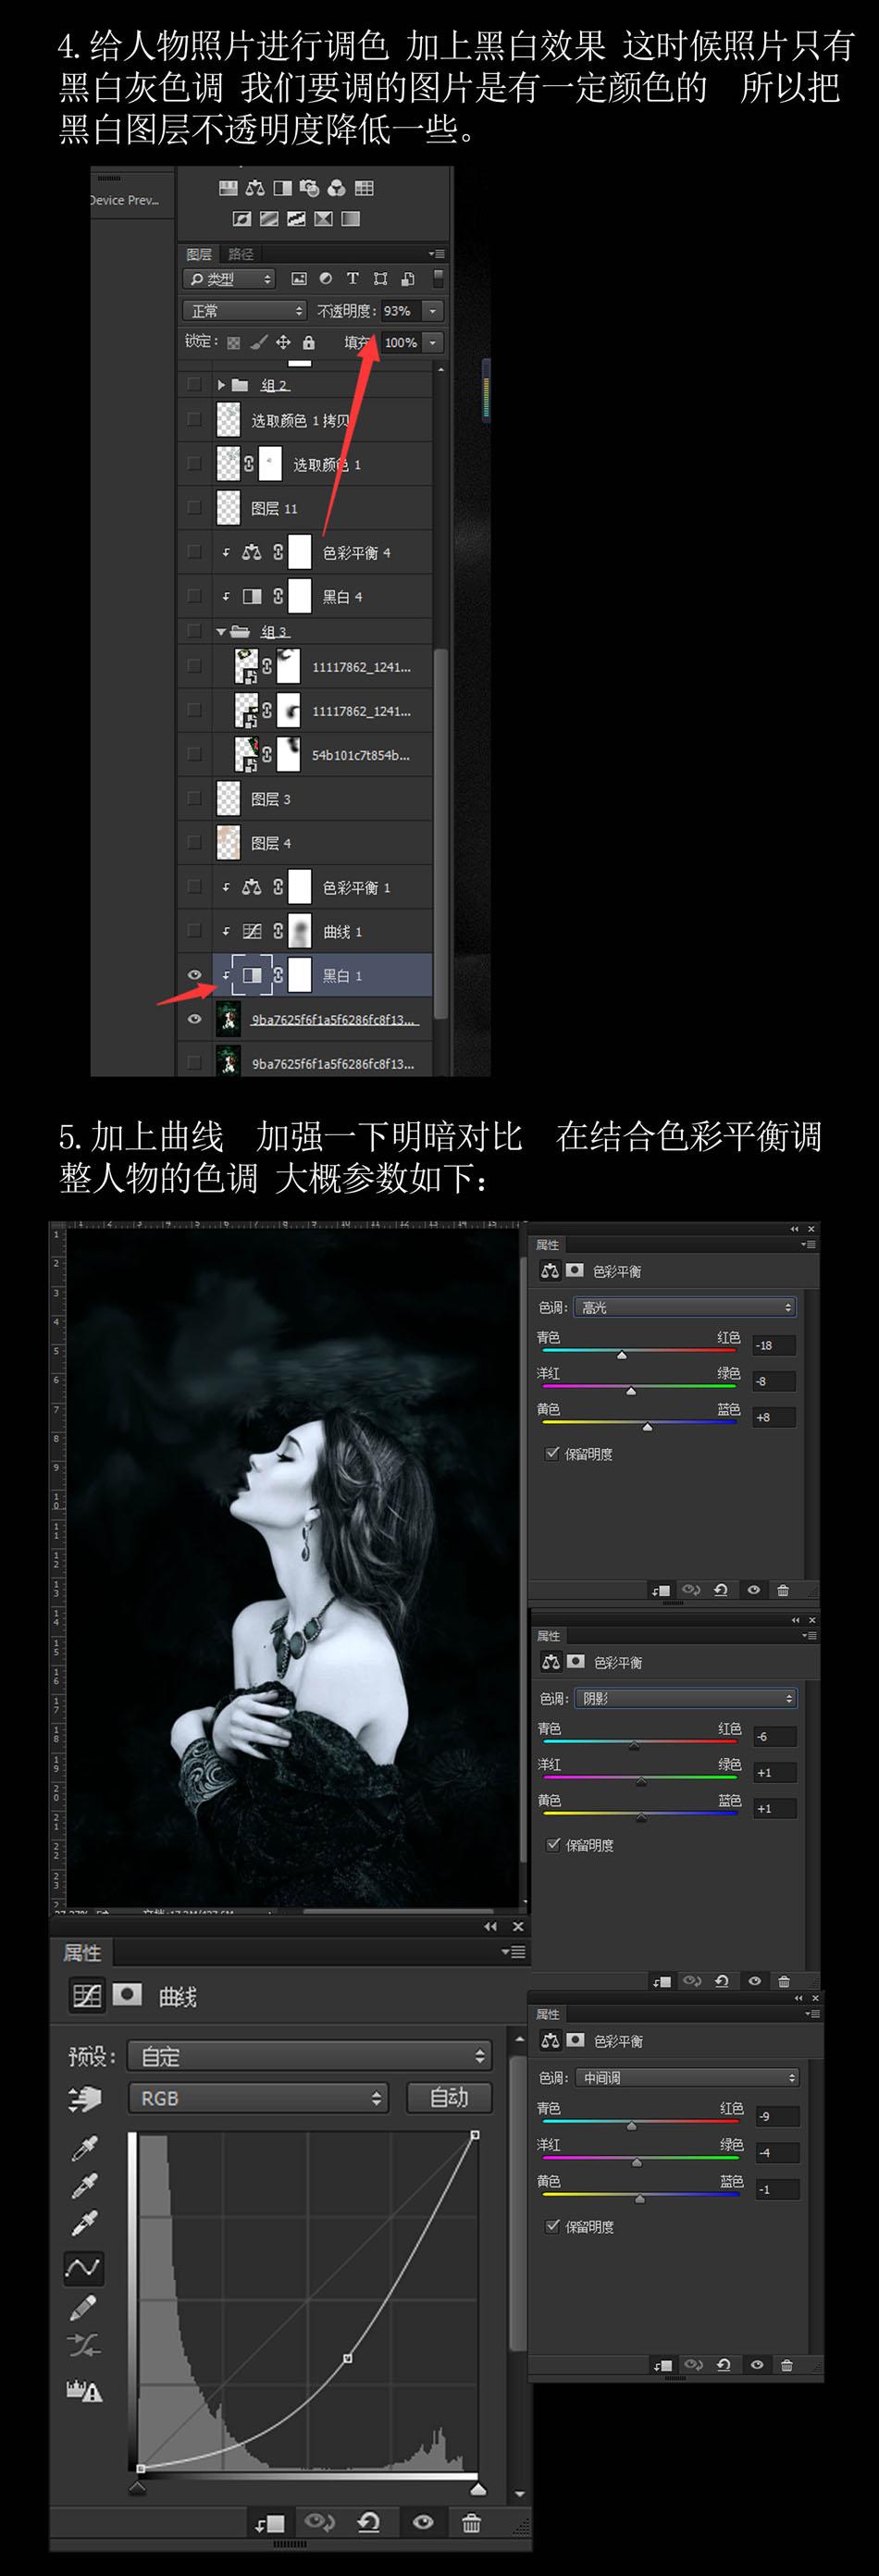 Photoshop合成恐怖主题风格的人像海报教程,PS教程,思缘教程网